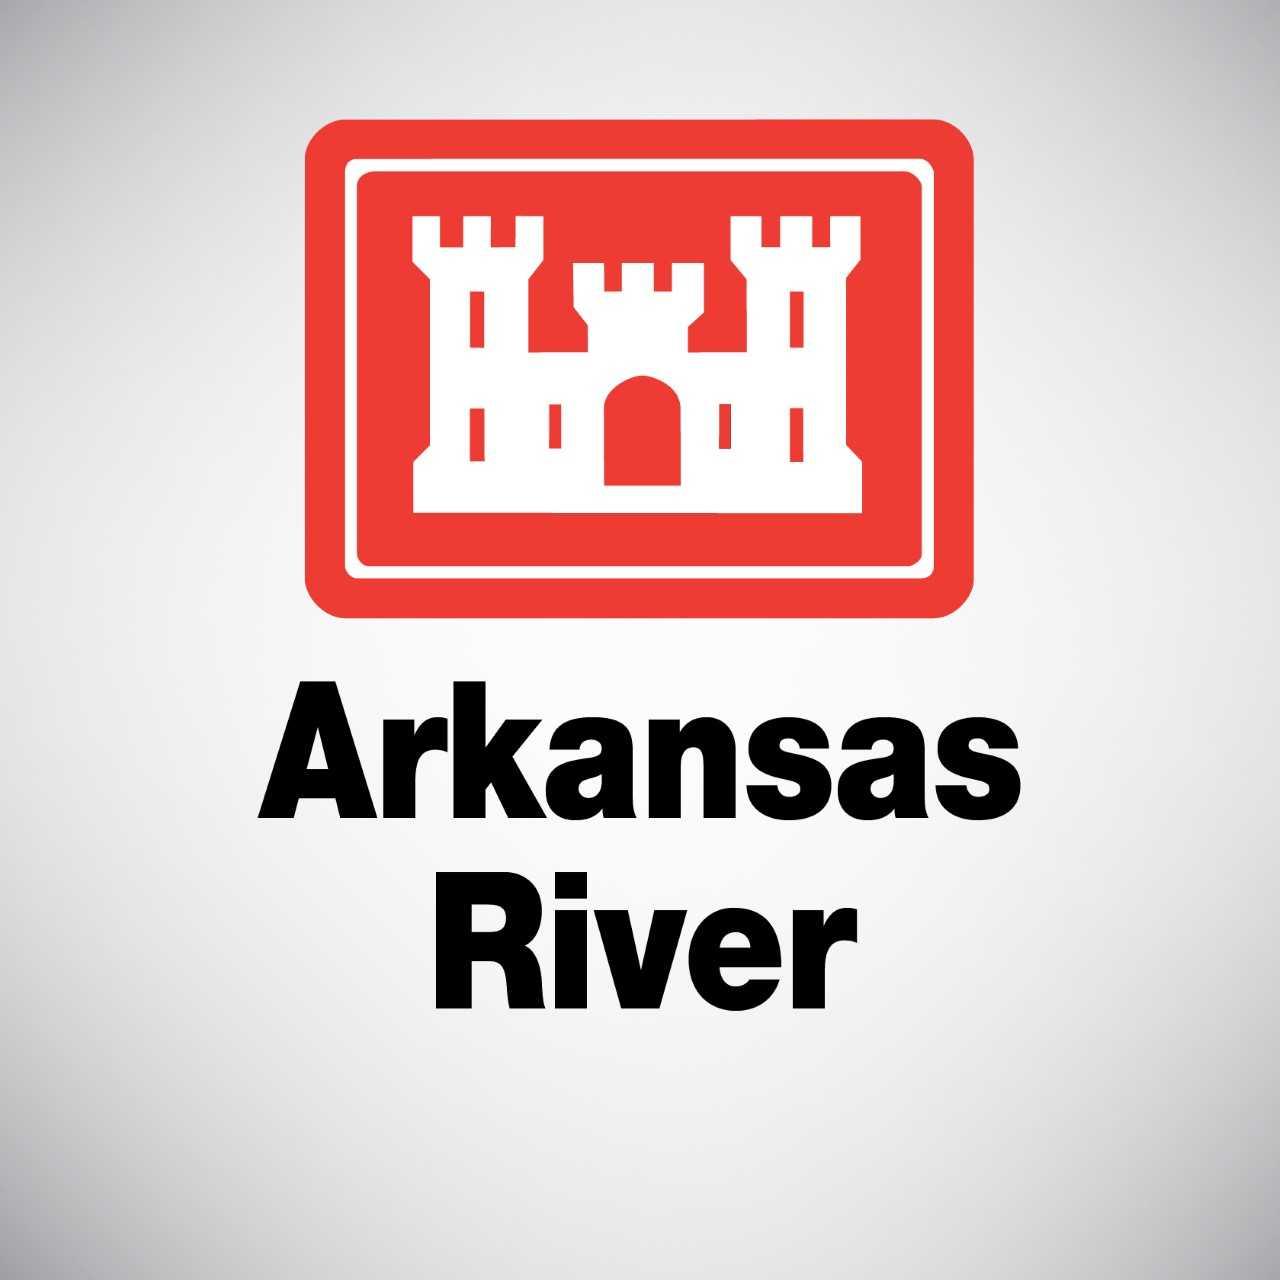 corps arkansas river_1560018709169.jfif.jpg